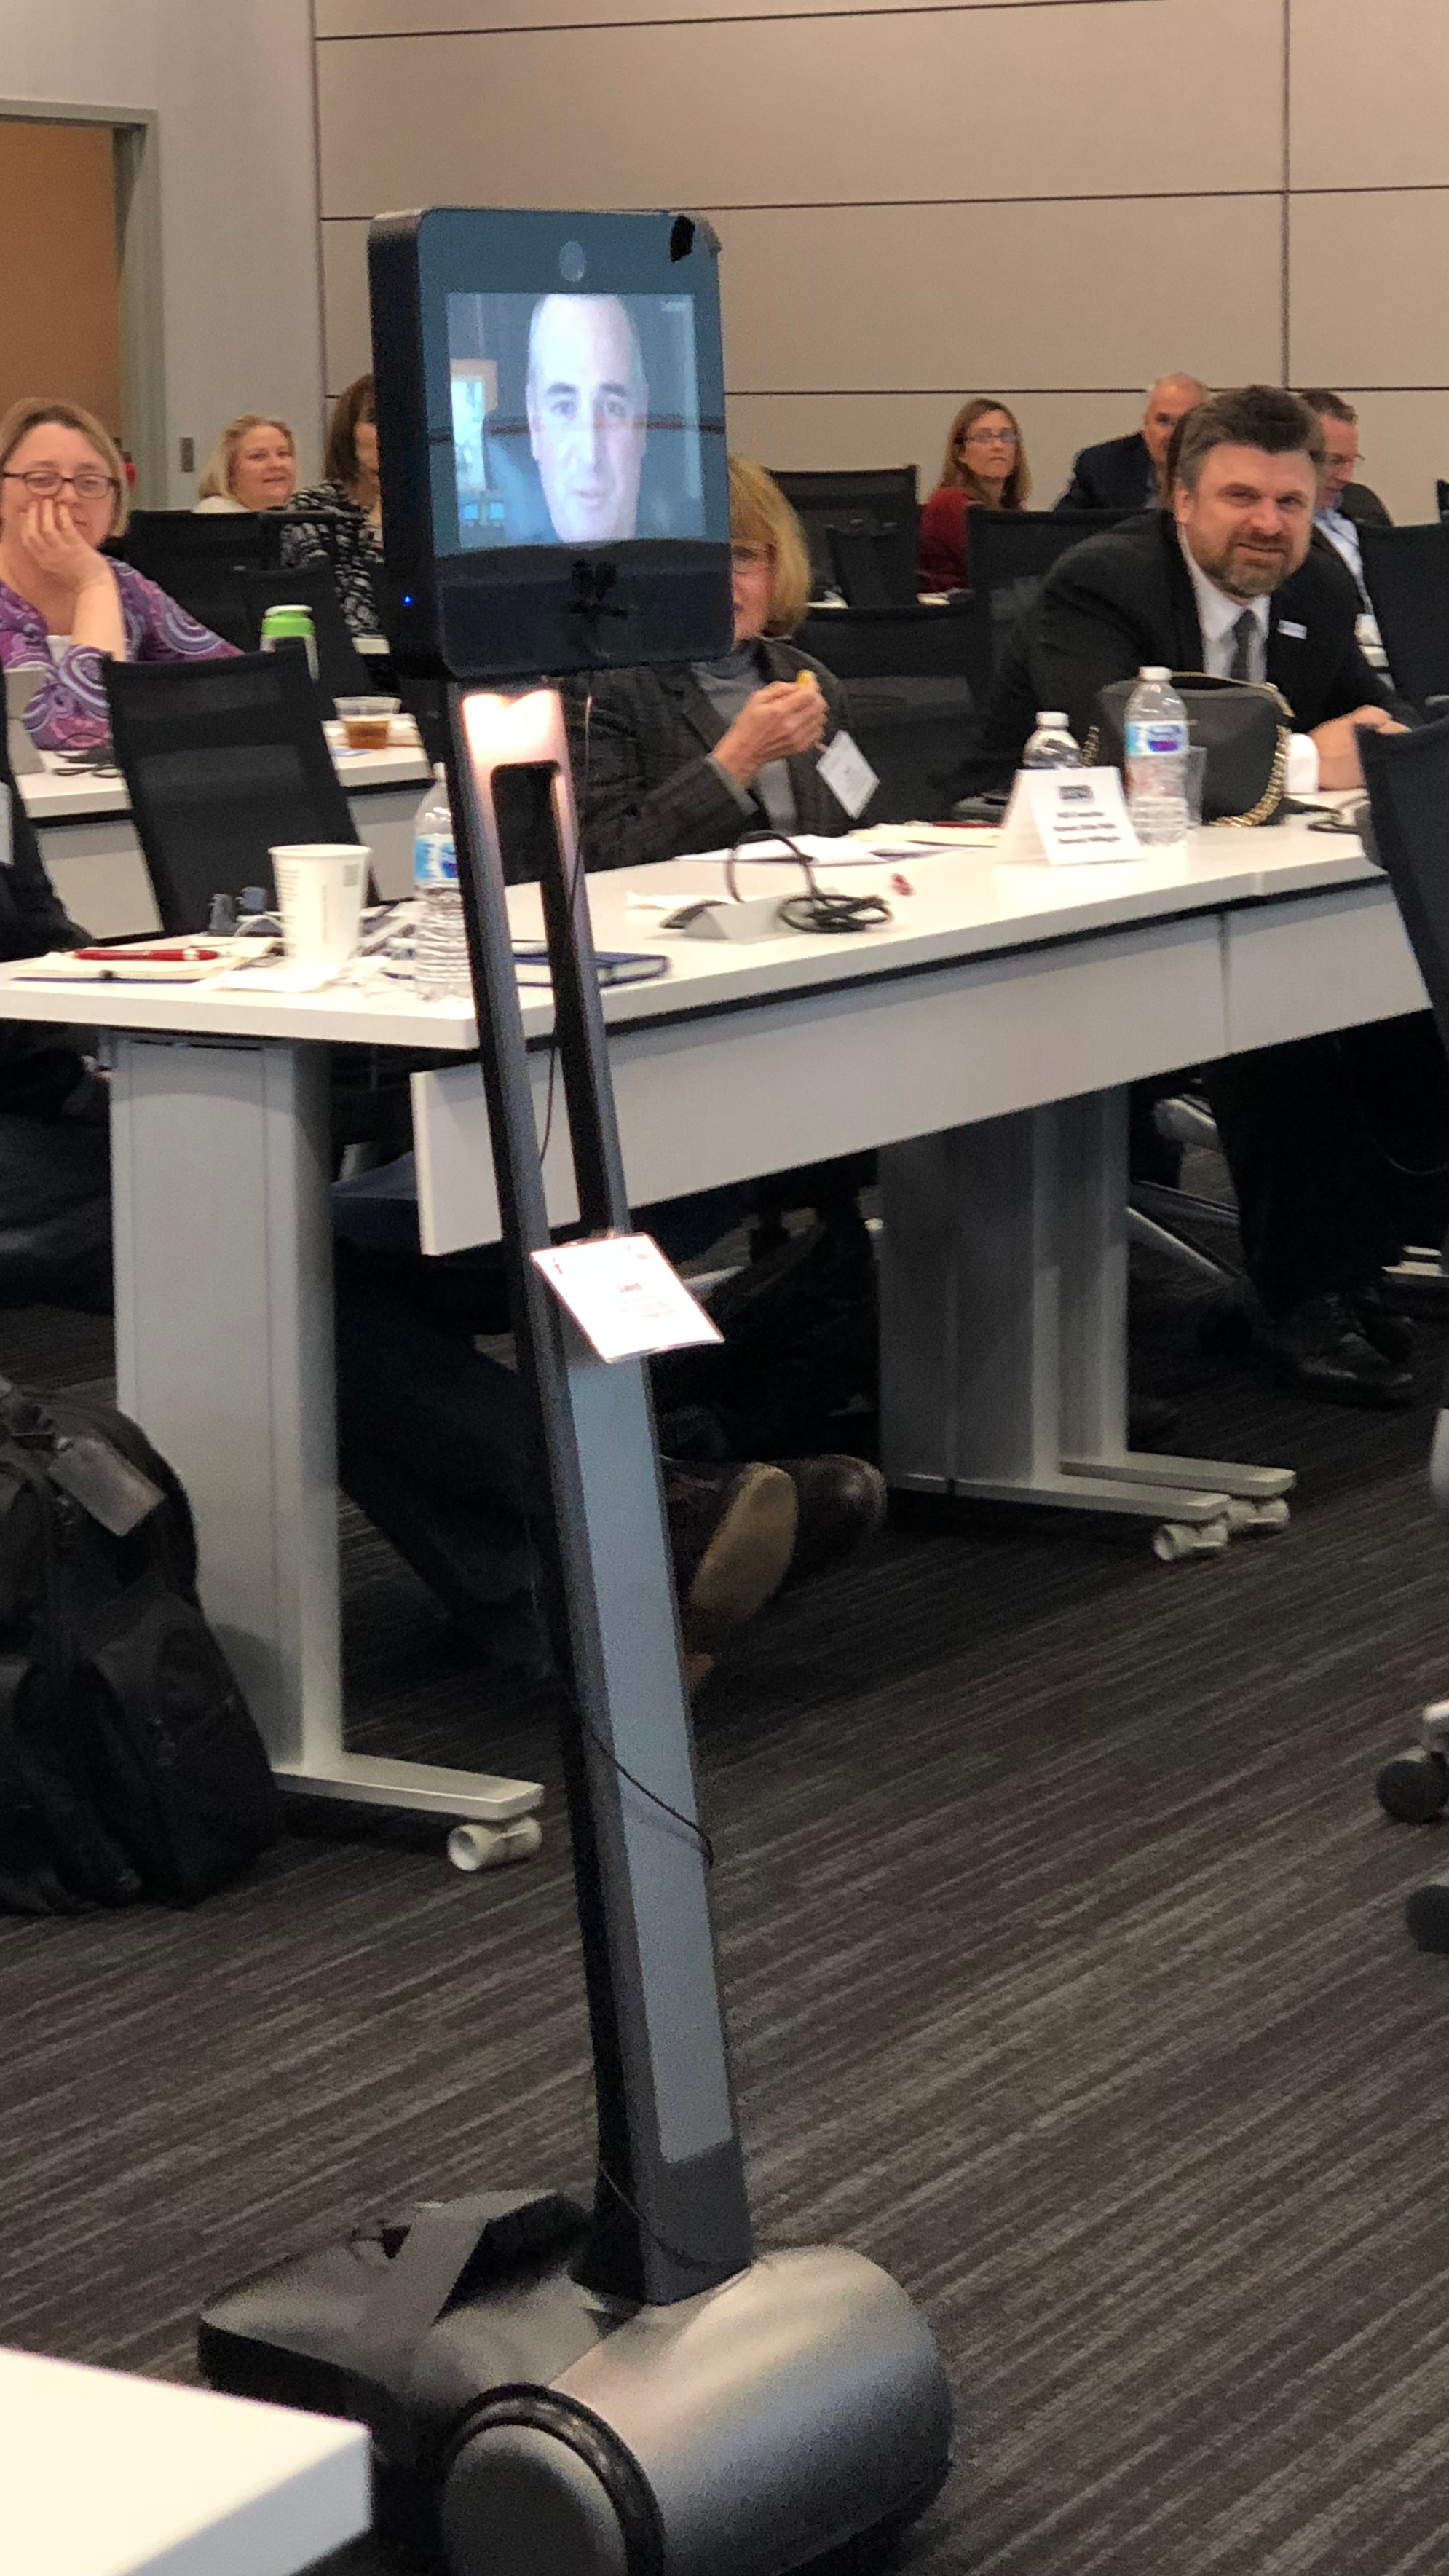 DeLo Beam at SmartTech2018